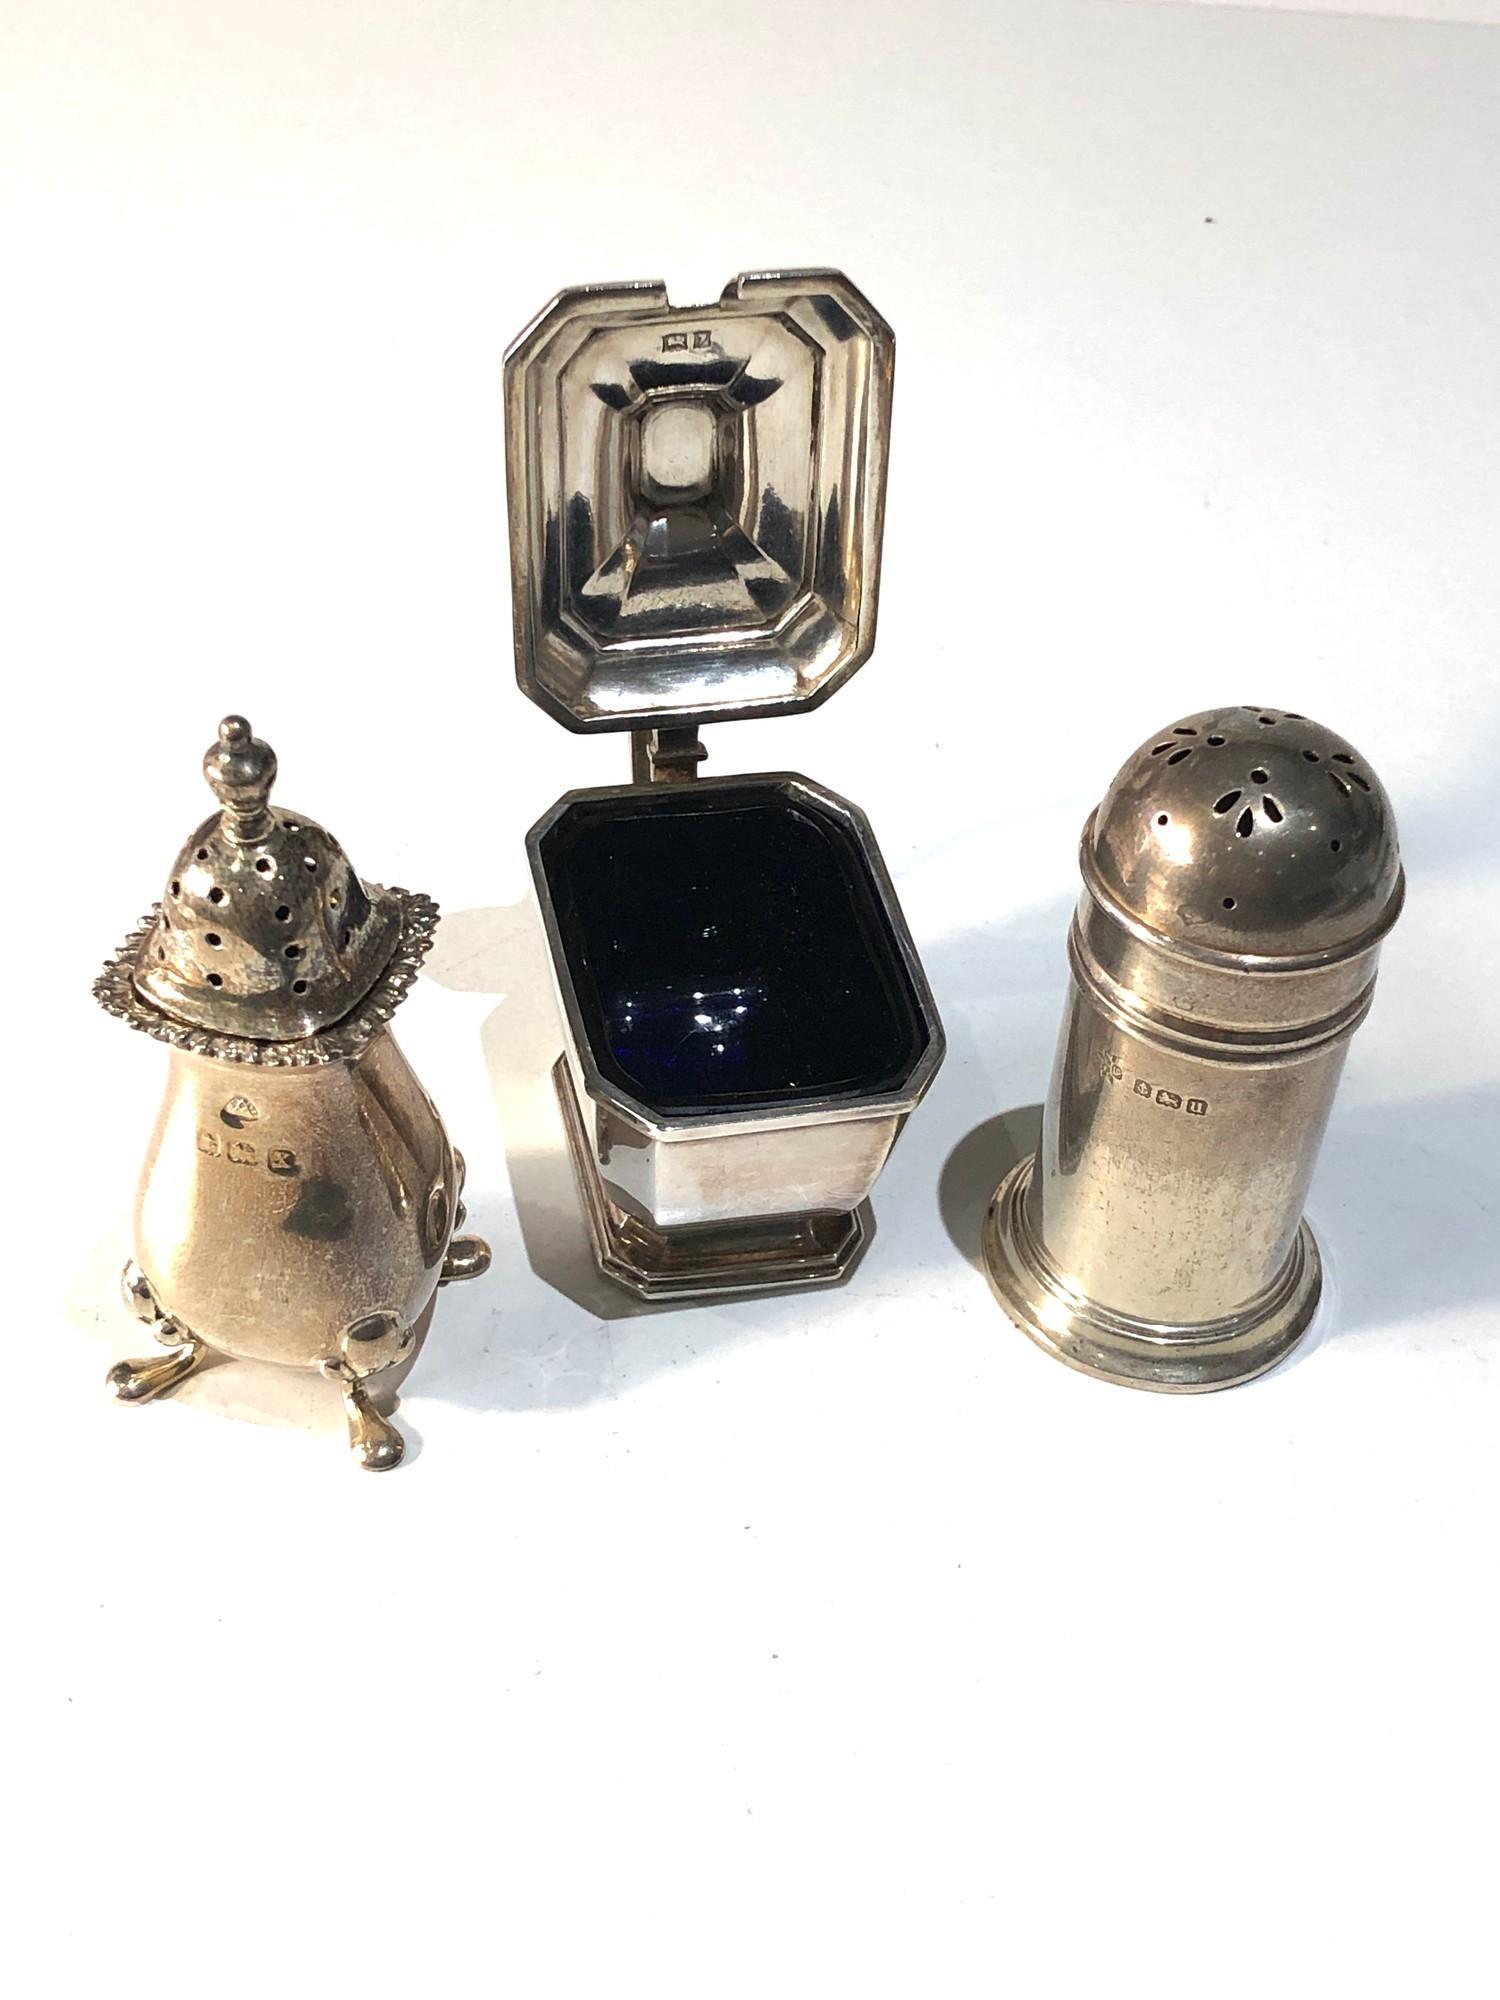 Silver cruet item includes mustard salt and pepper pots - Image 2 of 5